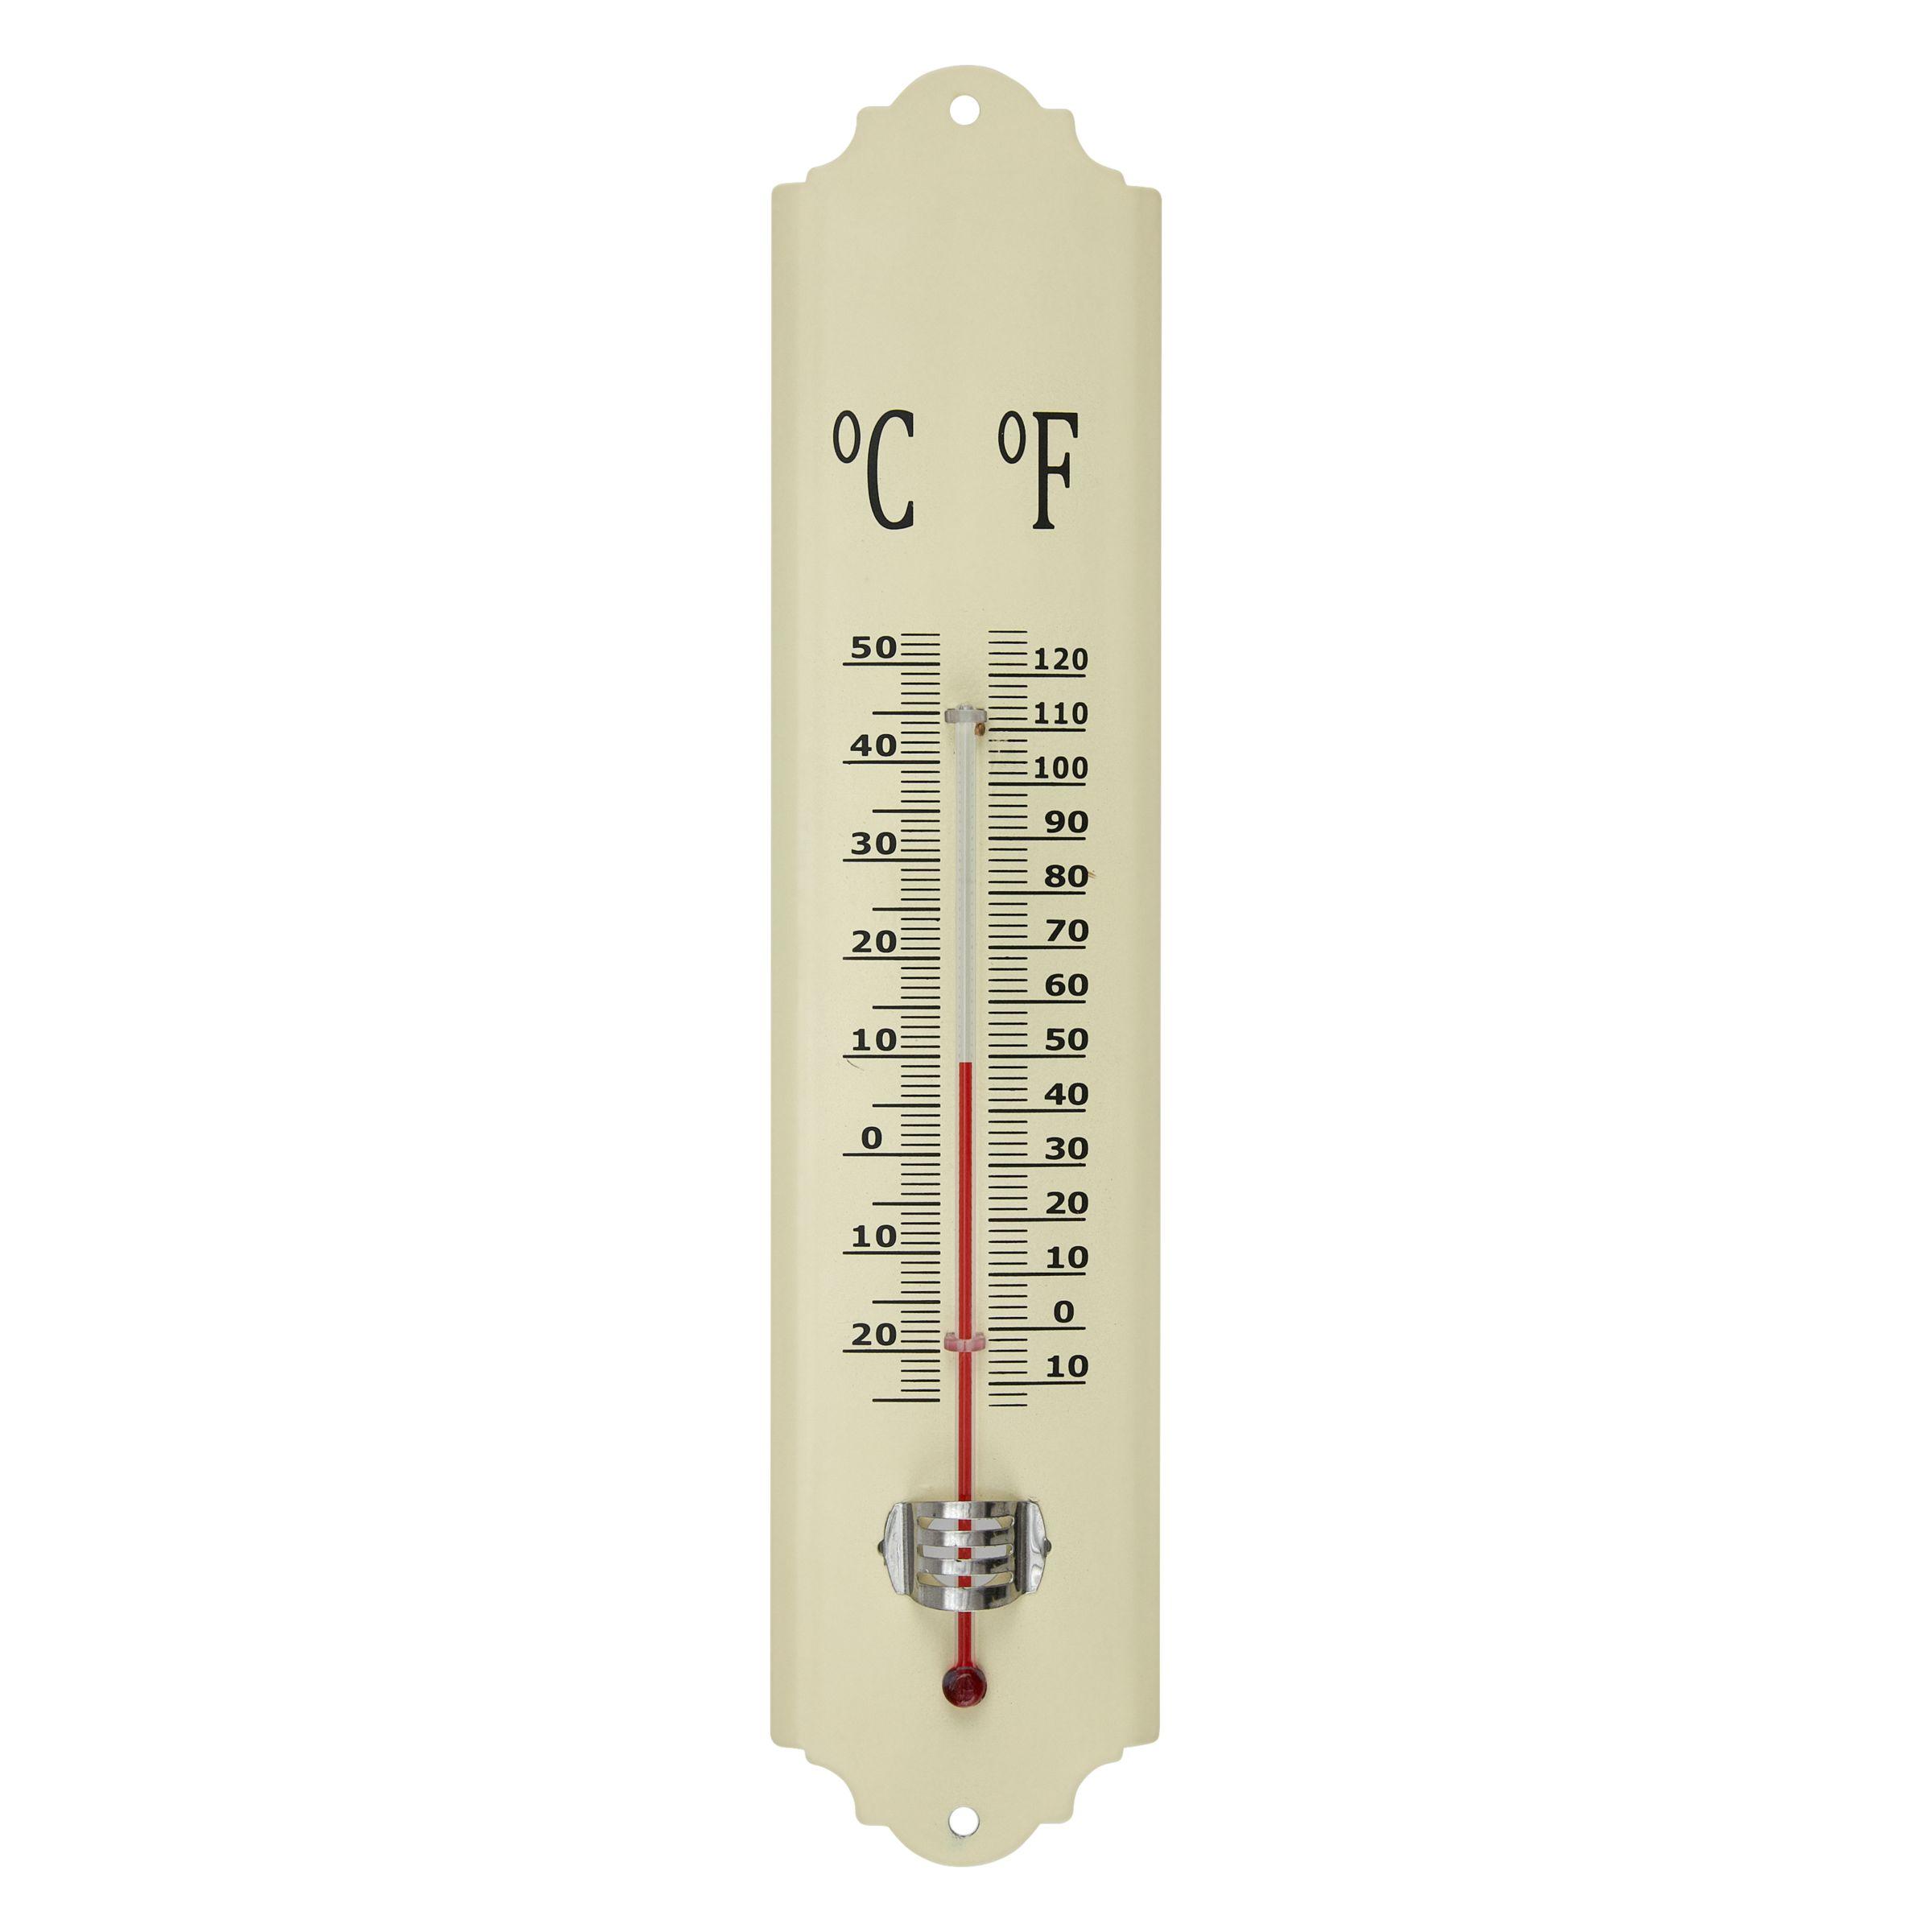 Fallen Fruits Enamel Thermometer, Cream